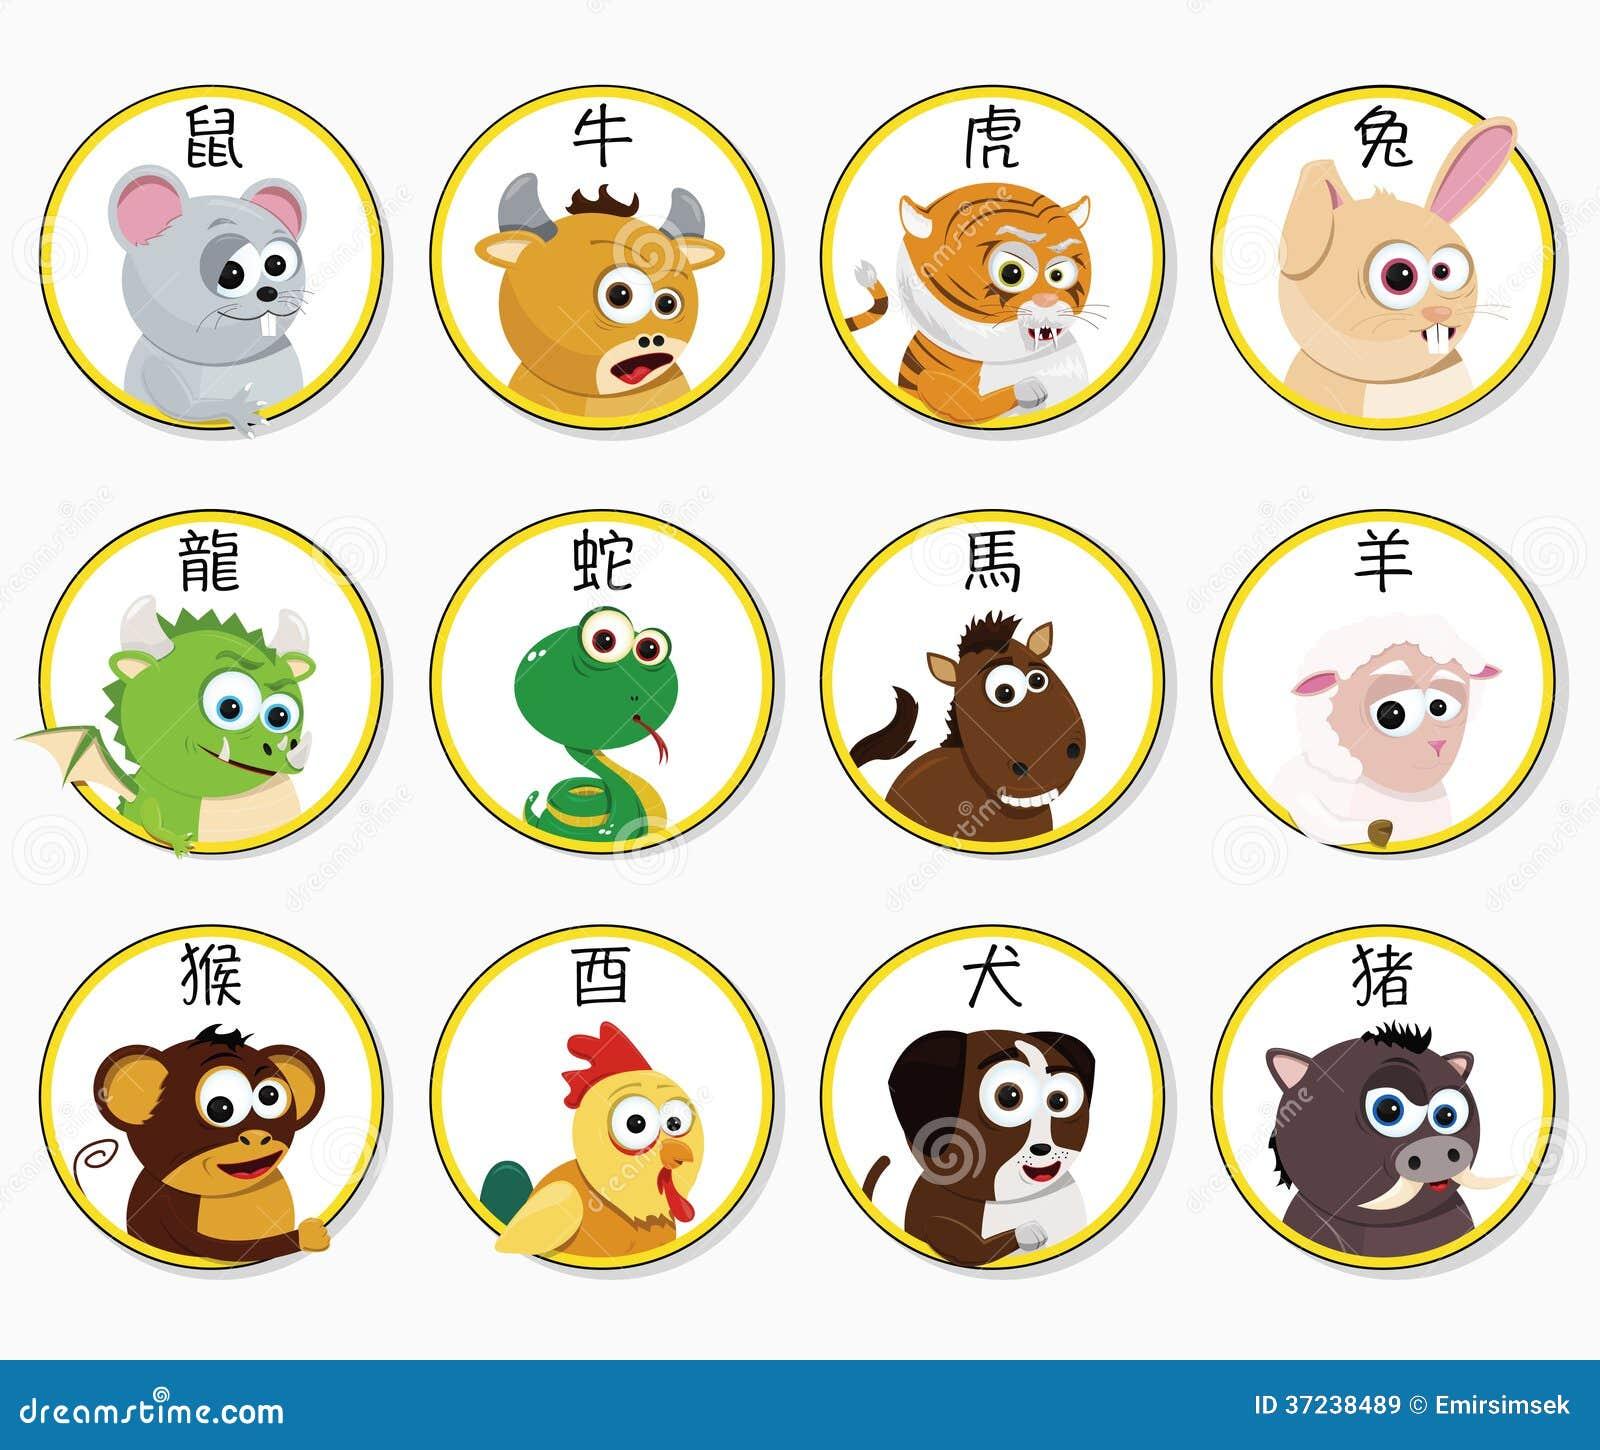 Chinese Zodiac Animals Royalty Free Stock Images - Image: 37238489